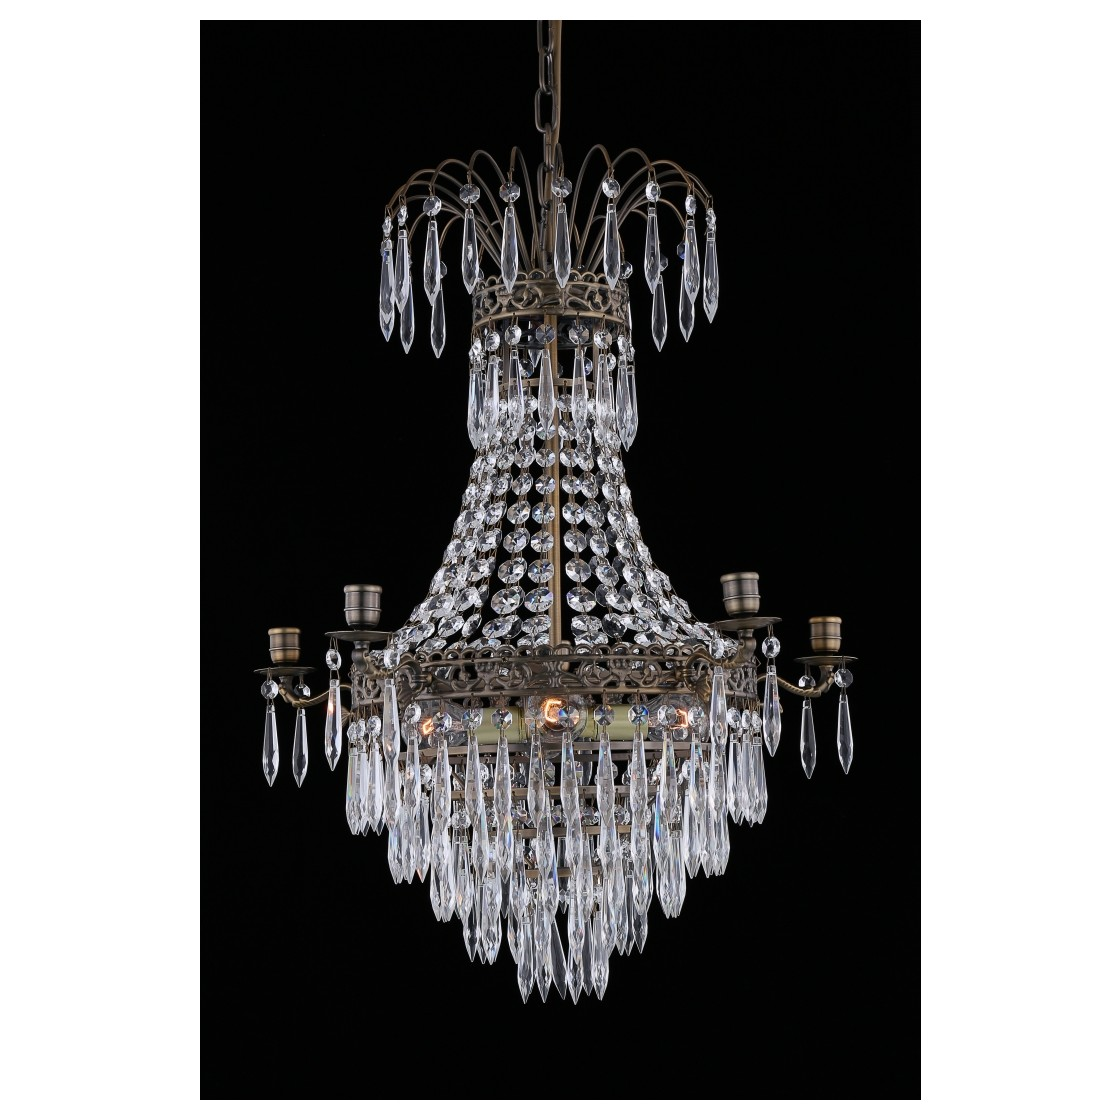 Empire Classic Ny Liten Antik Lampbutiken Se